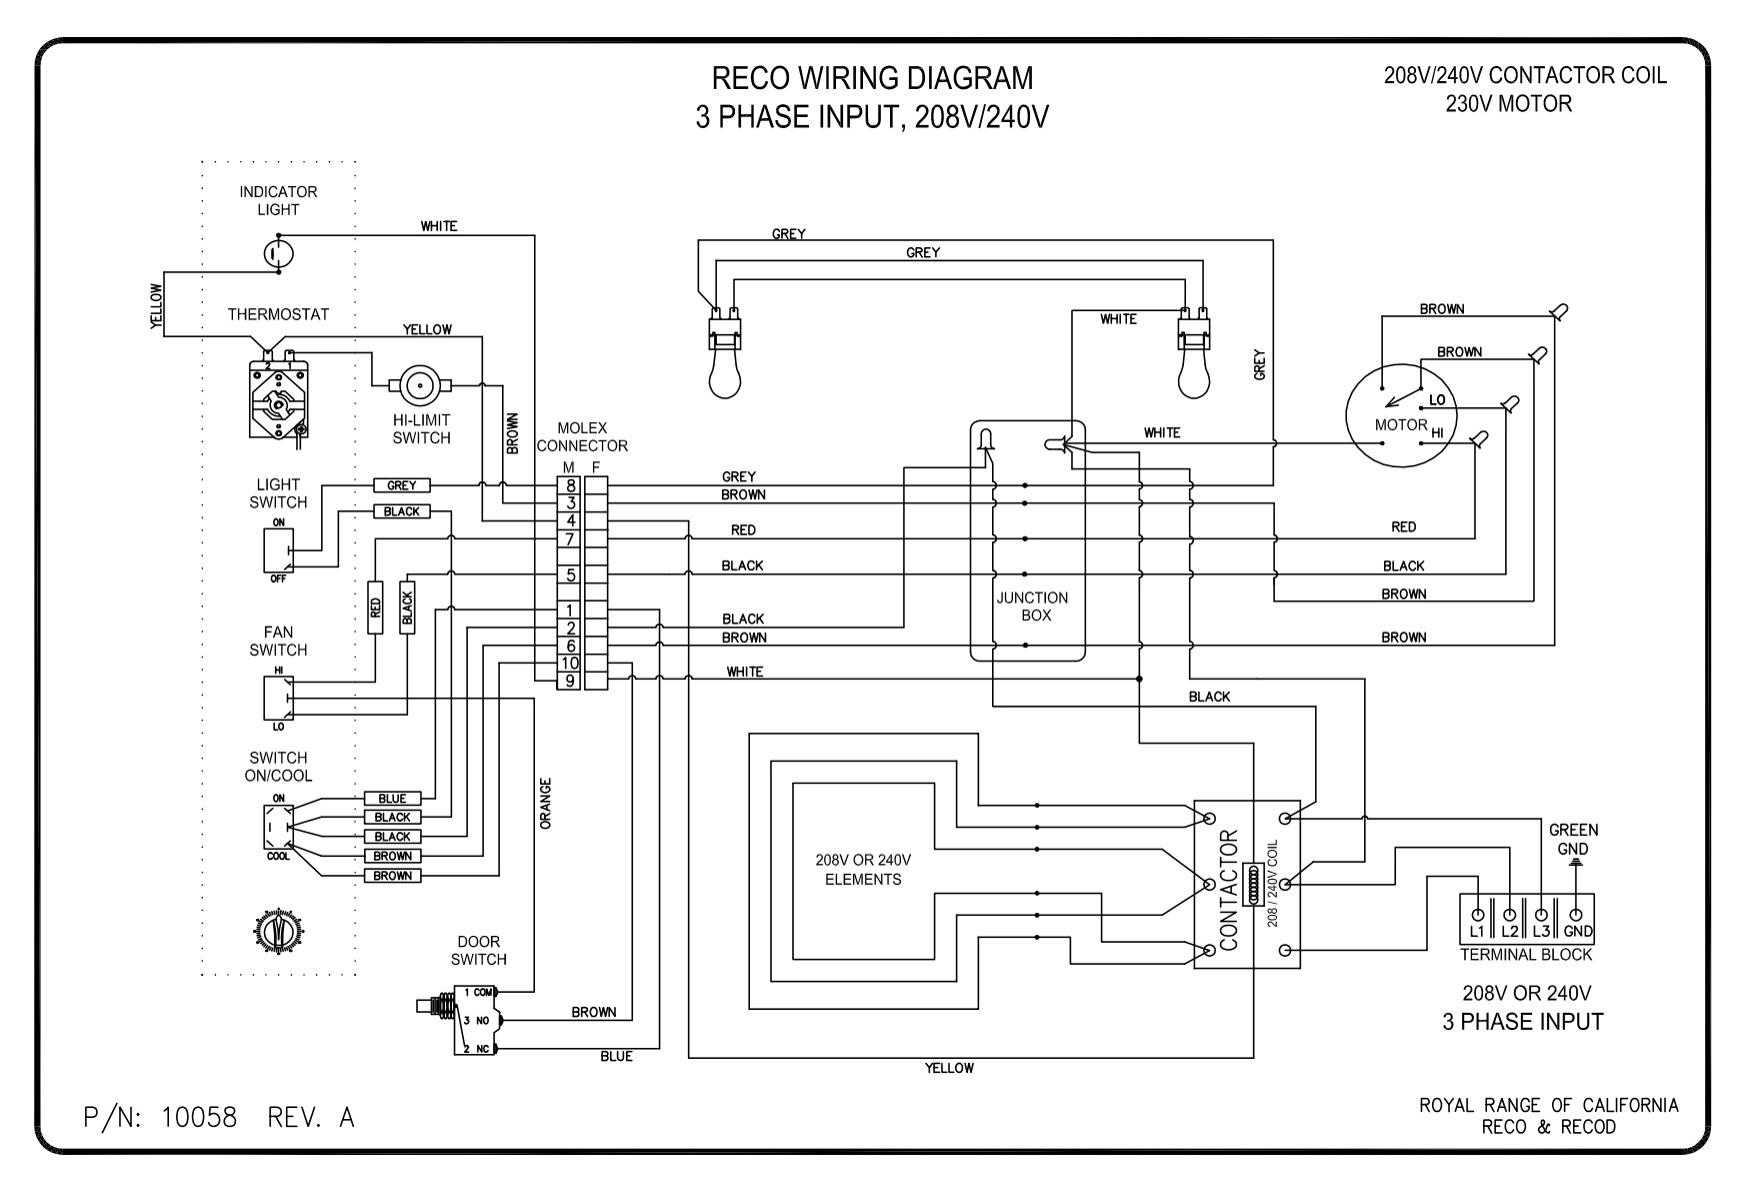 3 wire plug diagram for oven